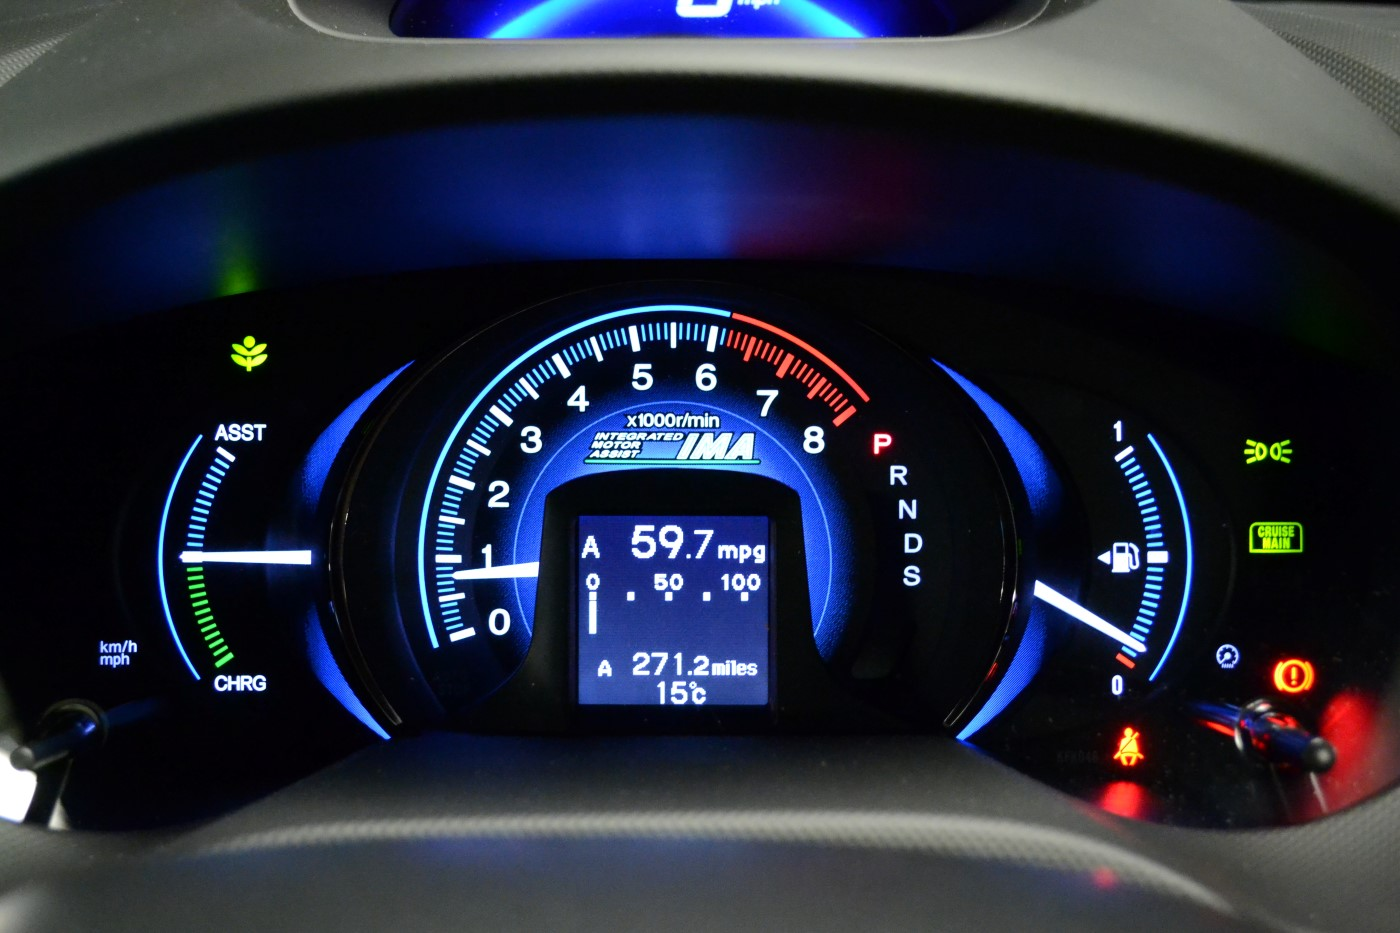 Fuel Filter 2004 Honda Pilot Gas Mileage Displays In Cars Accurate Or Optimistic